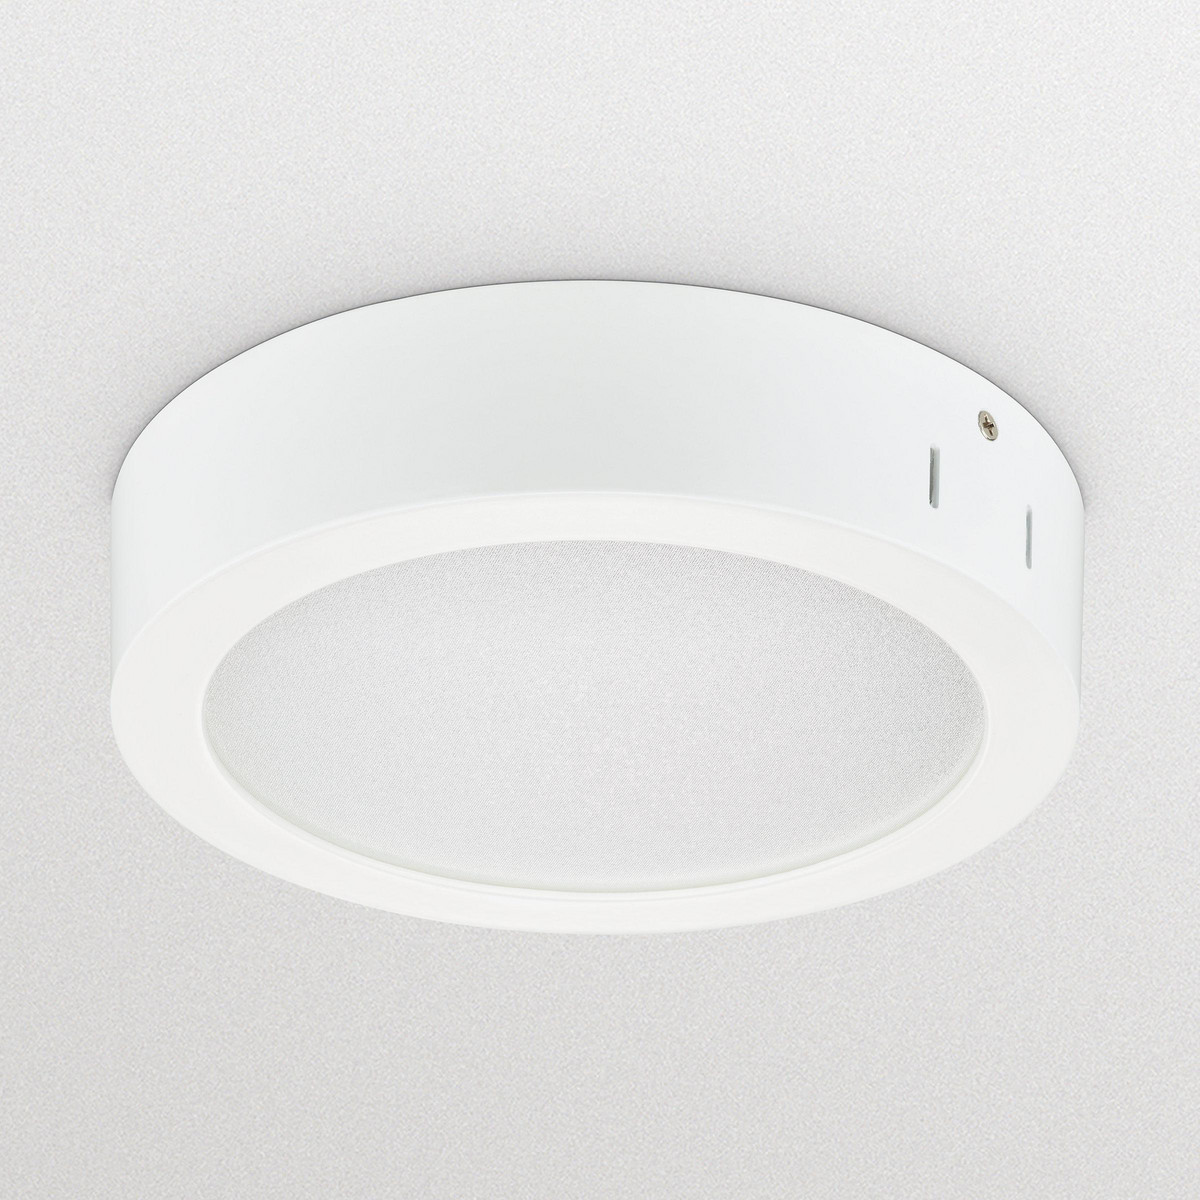 CoreLine SlimDownlight Gen3 Påbyg DN145C LED 2100lm/840 Hvid